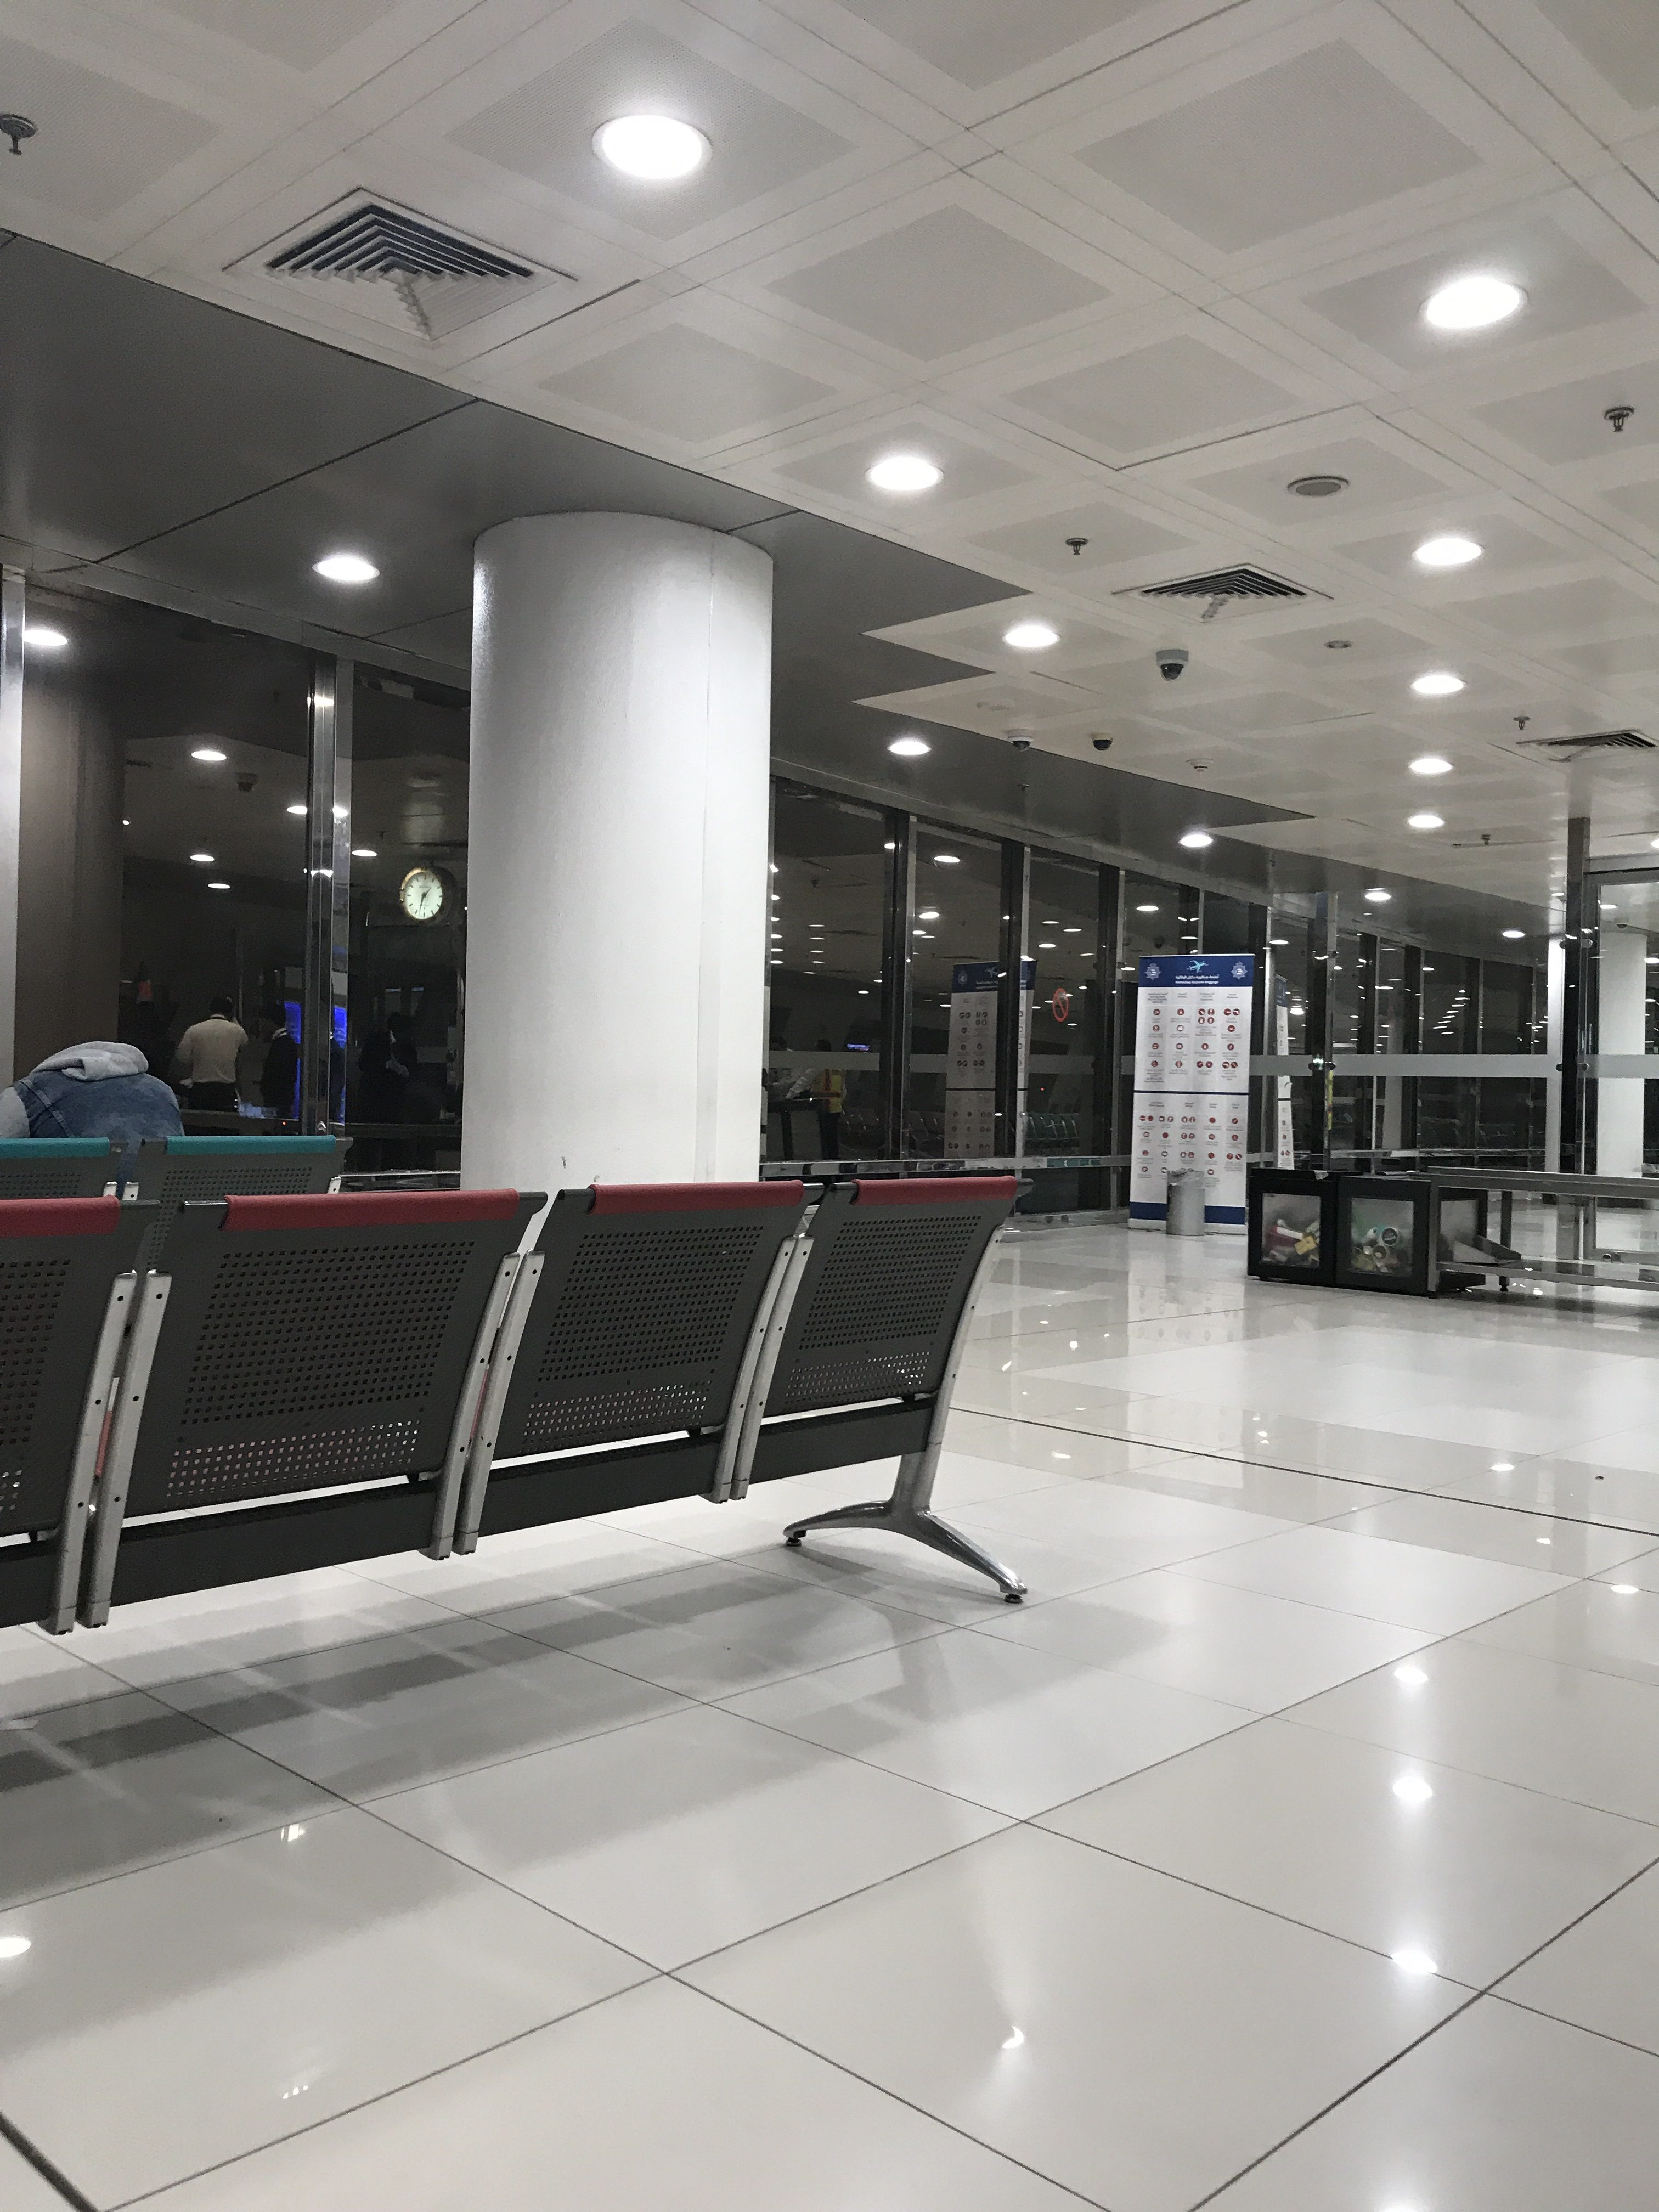 Kuwait Airport Customer Reviews | SKYTRAX